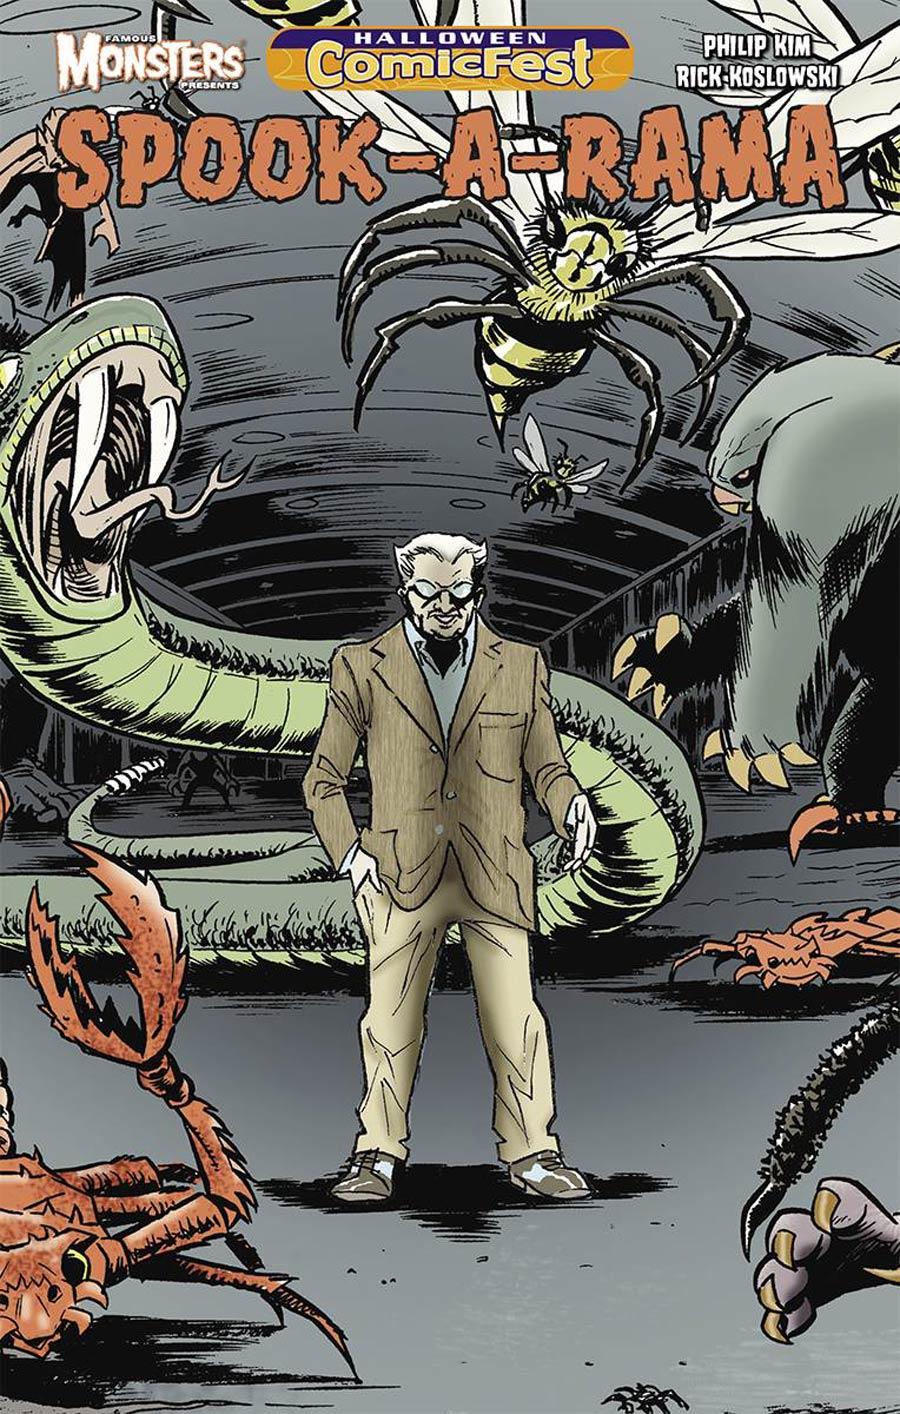 HCF 2015 Famous Monsters Presents Spook-A-Rama Mini-Comic